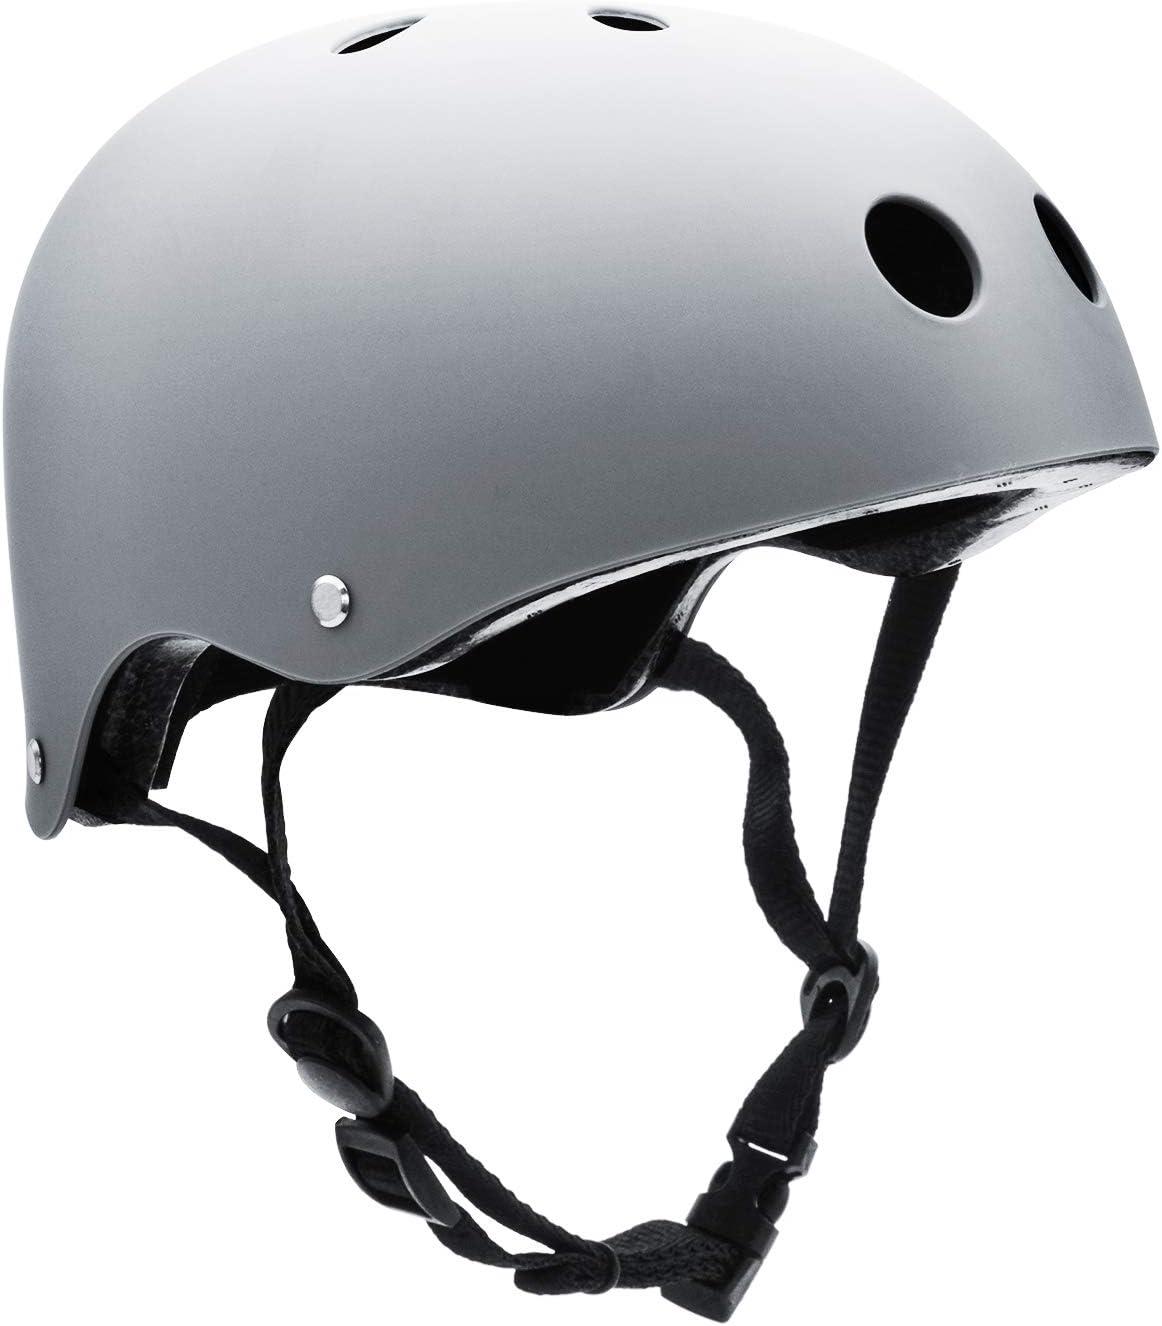 Climbing BMX FerDIM Kids//Adult Skateboard Helmet with Removable Liner for Skate Inline Skating Roller Skate Scooter Bike Skiing Adjustable Straps Multi Color Cycling Longboard Skateboarding